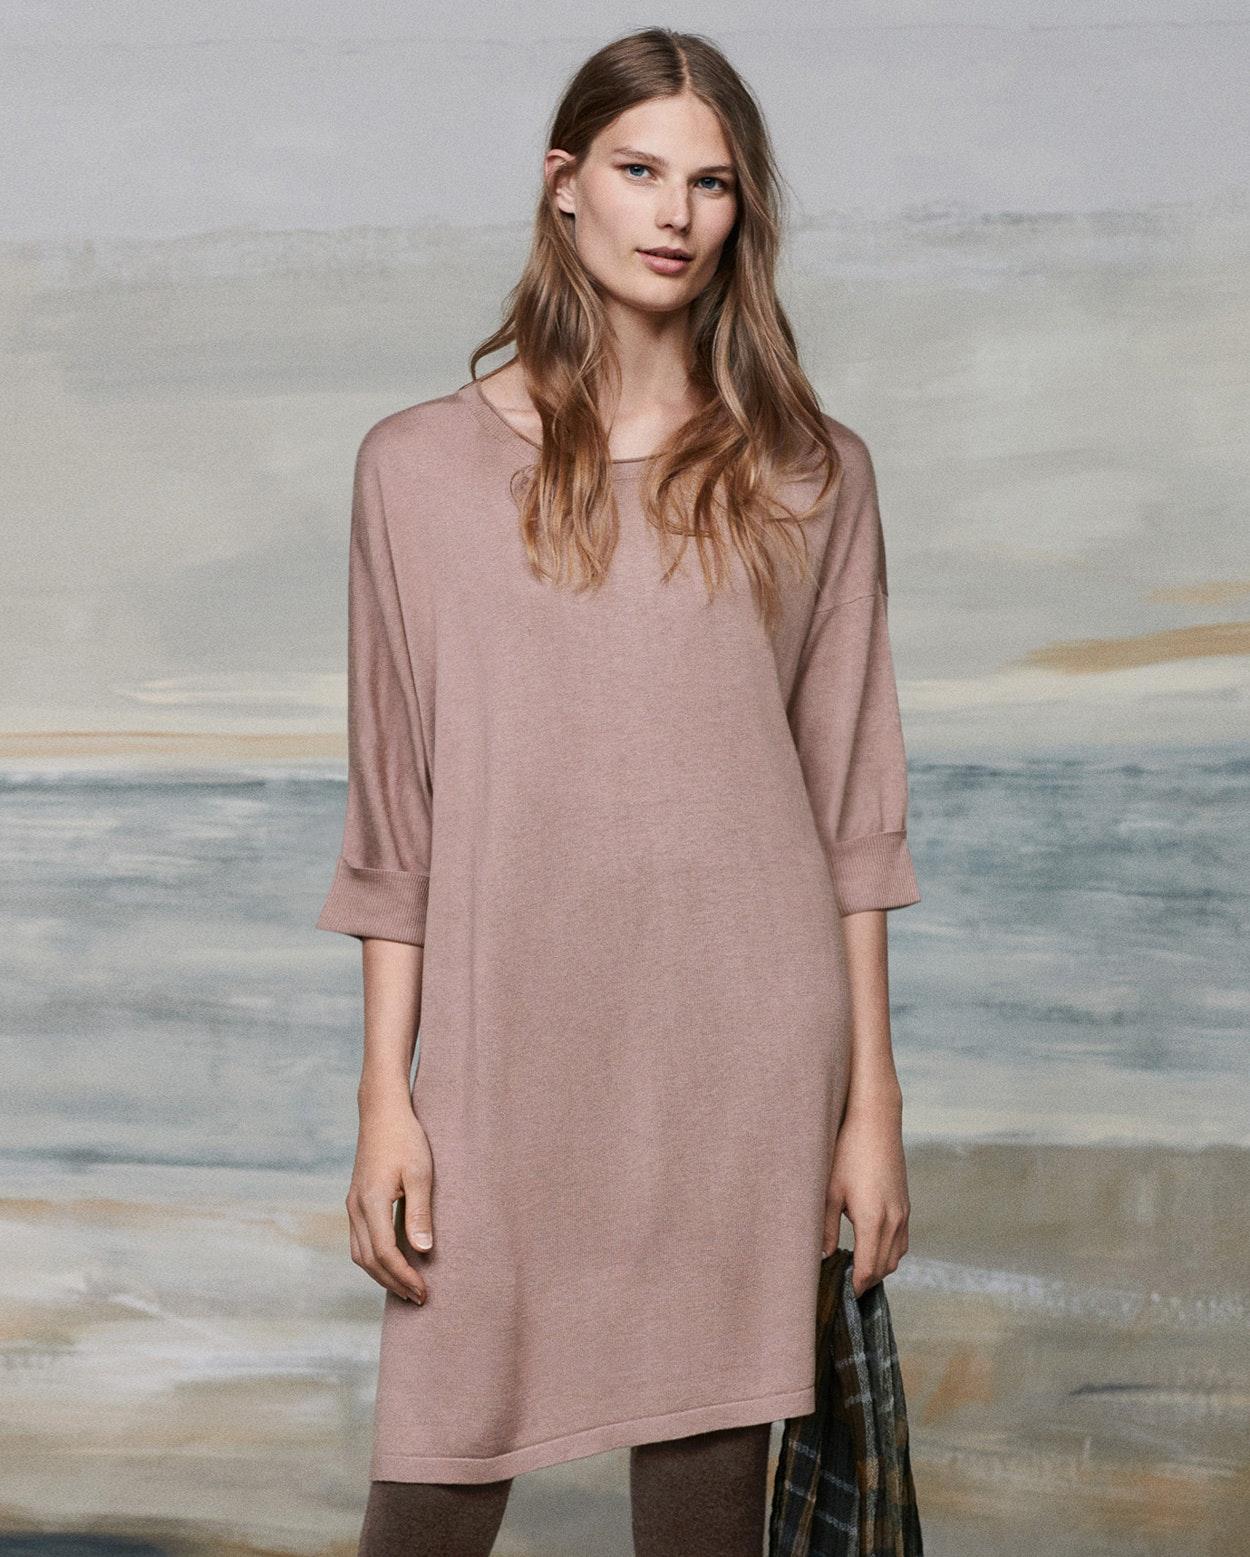 f6005f62bfb Image of Silk cashmere tunic dress